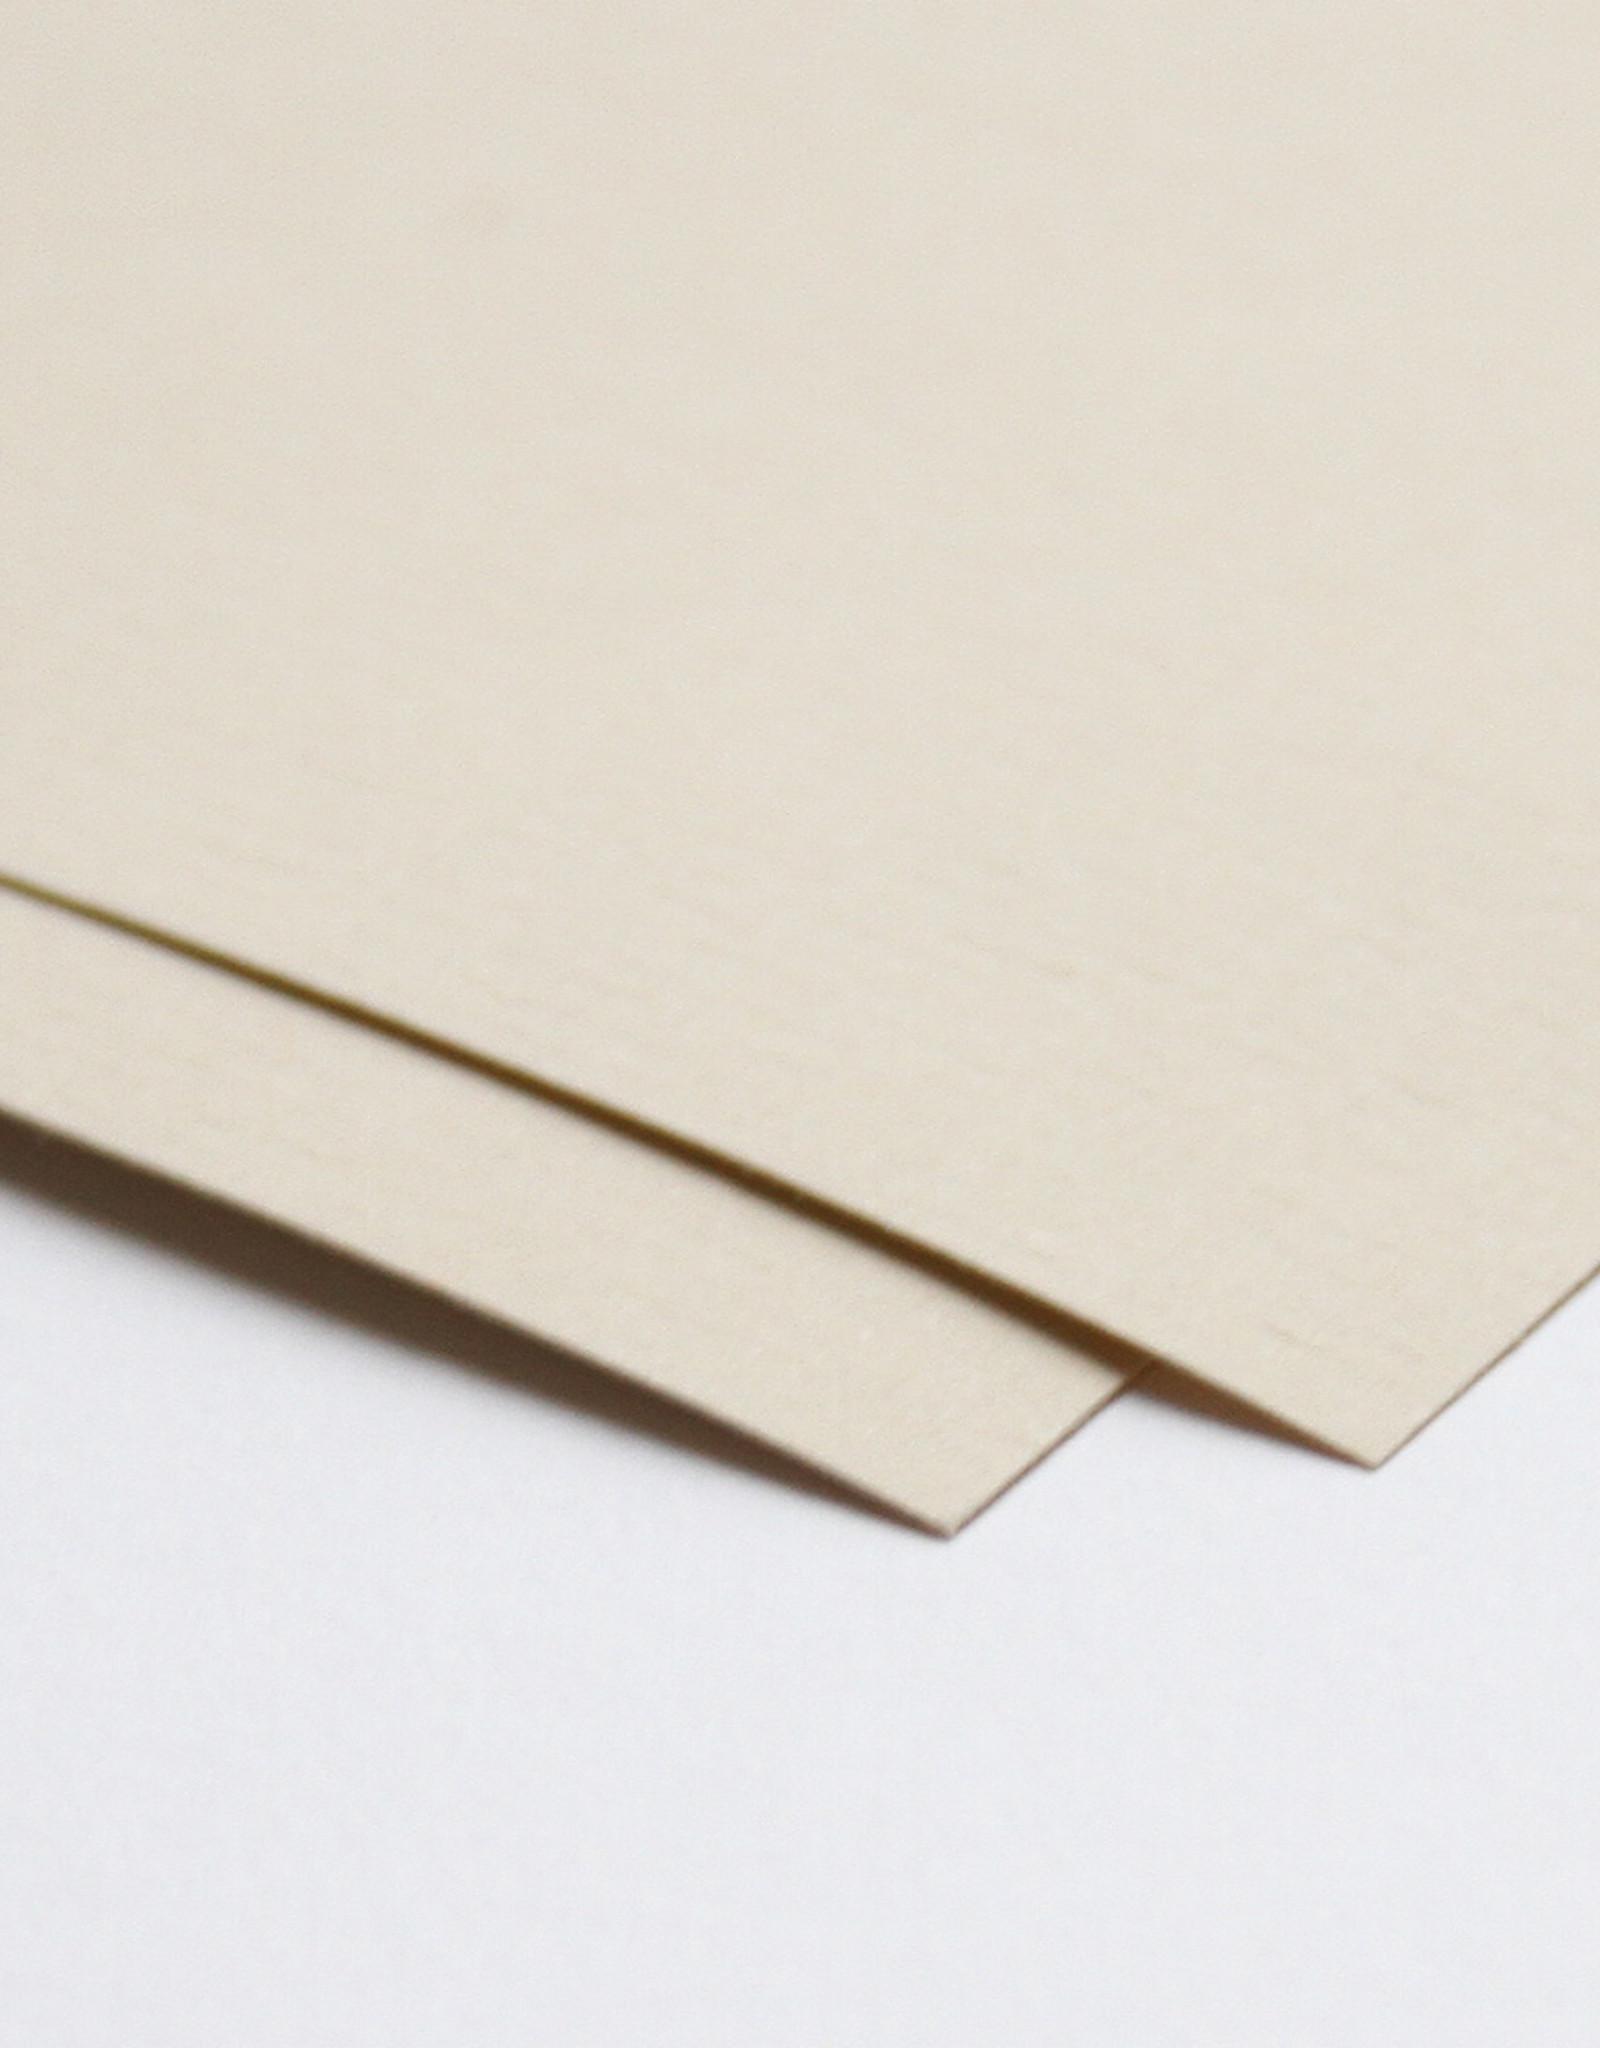 Fabriano 5 vel Ingres Papier 50 x 70 cm 160 grs Avorio Zand Licht Gelig